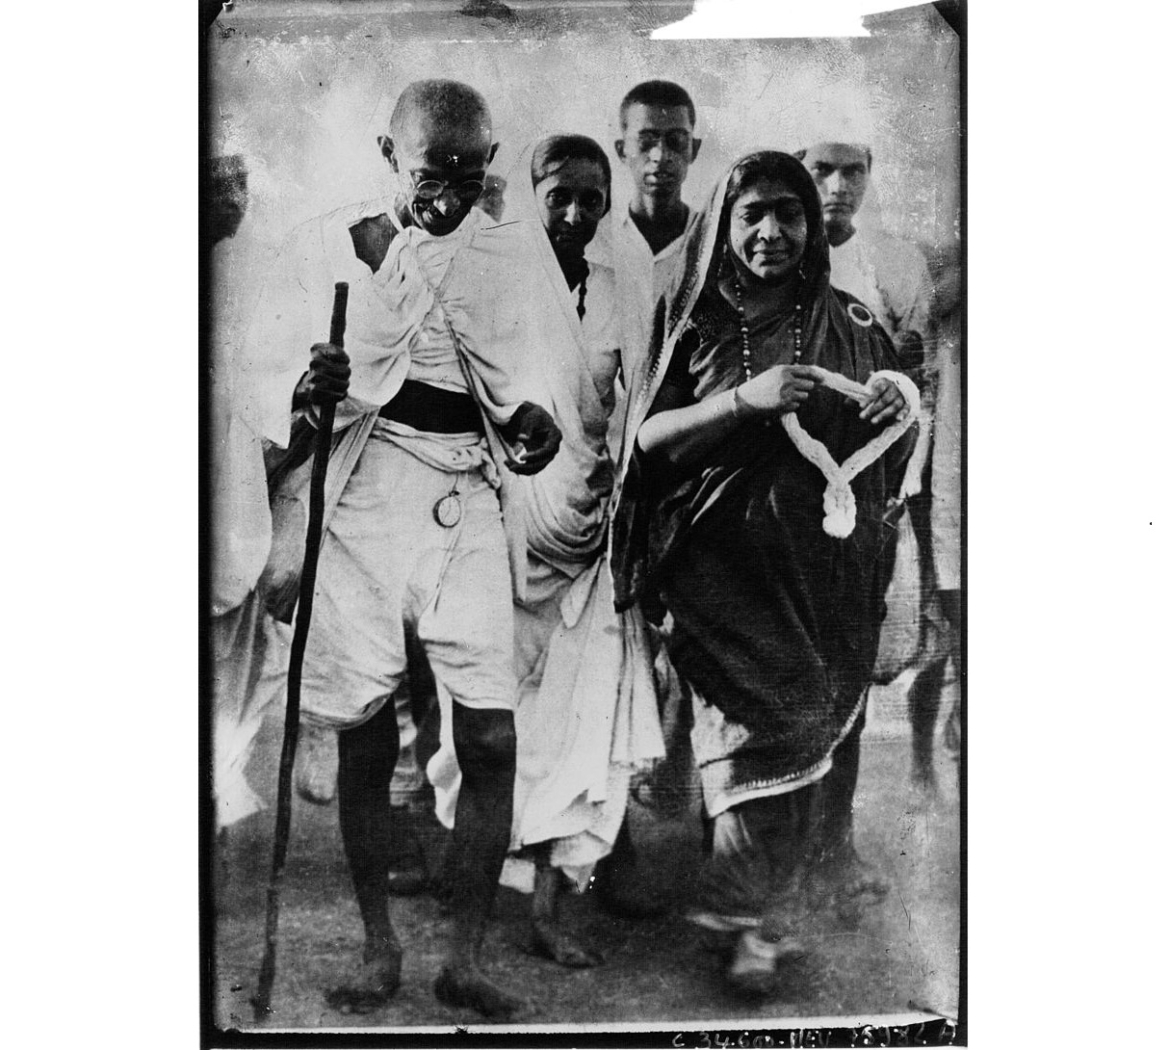 Mahatma Gandhi with Sarojini Naidu during the Salt March